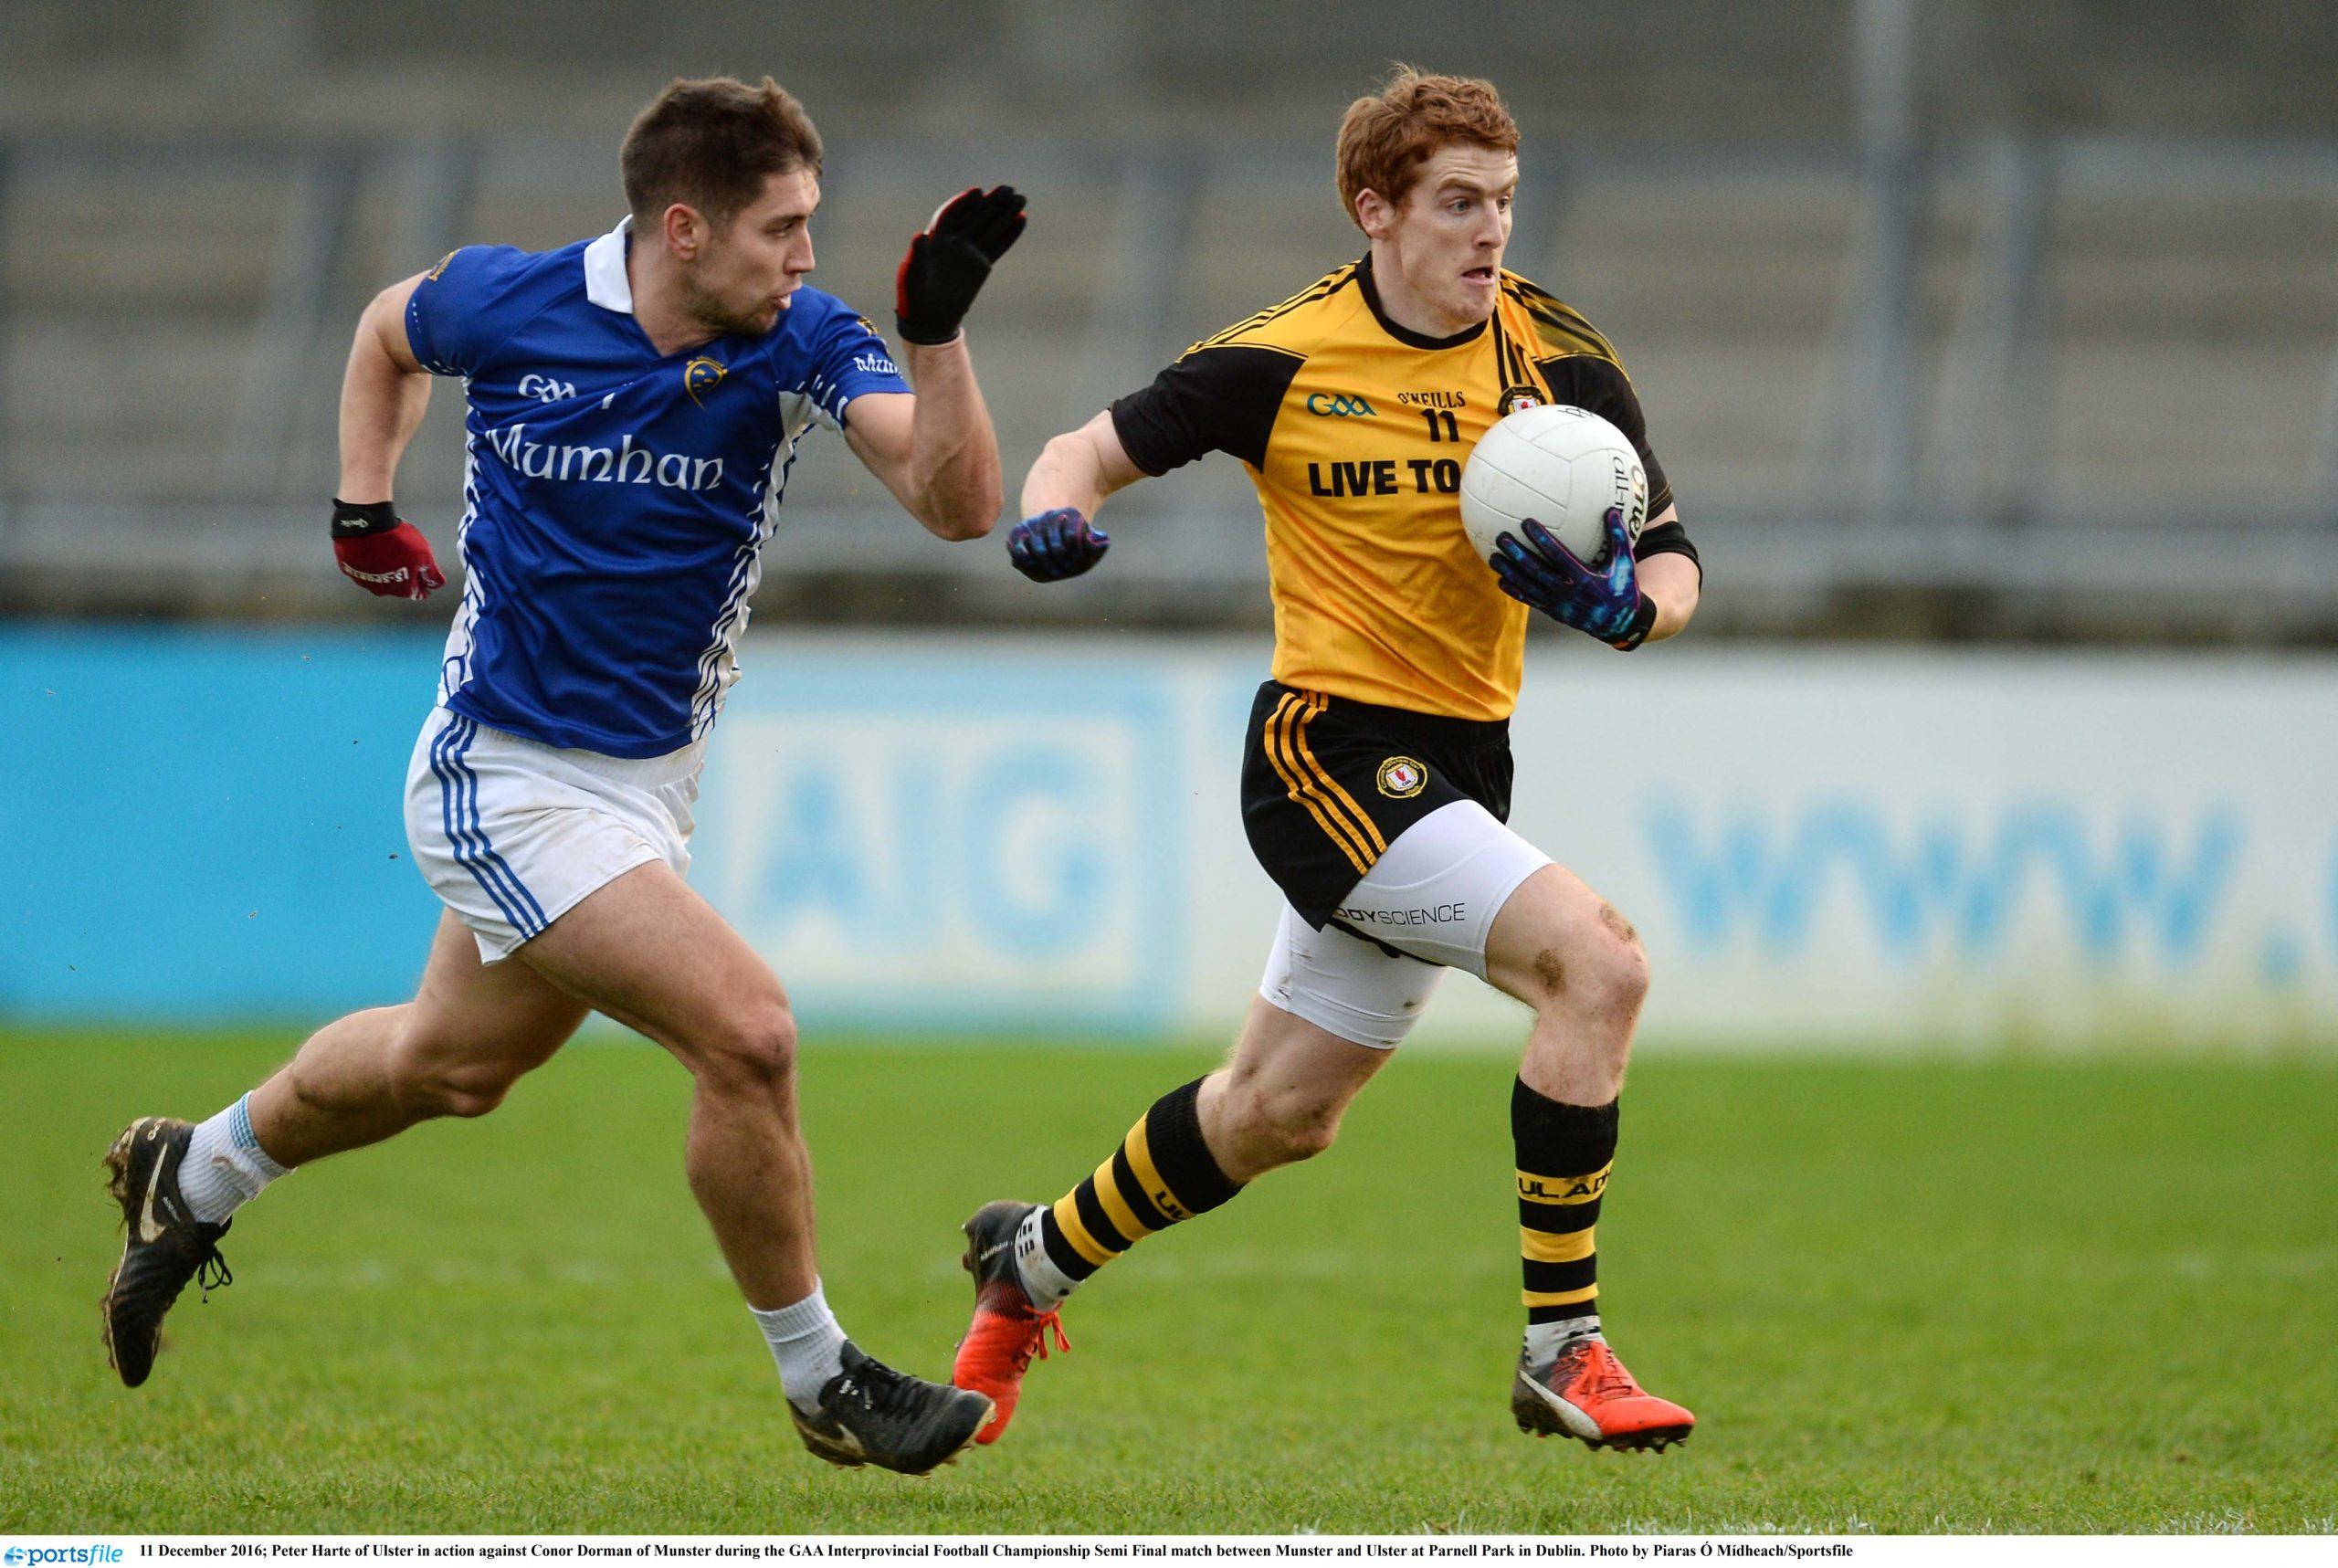 Ulster teams in Inter-Provincial Semi-Finals Action